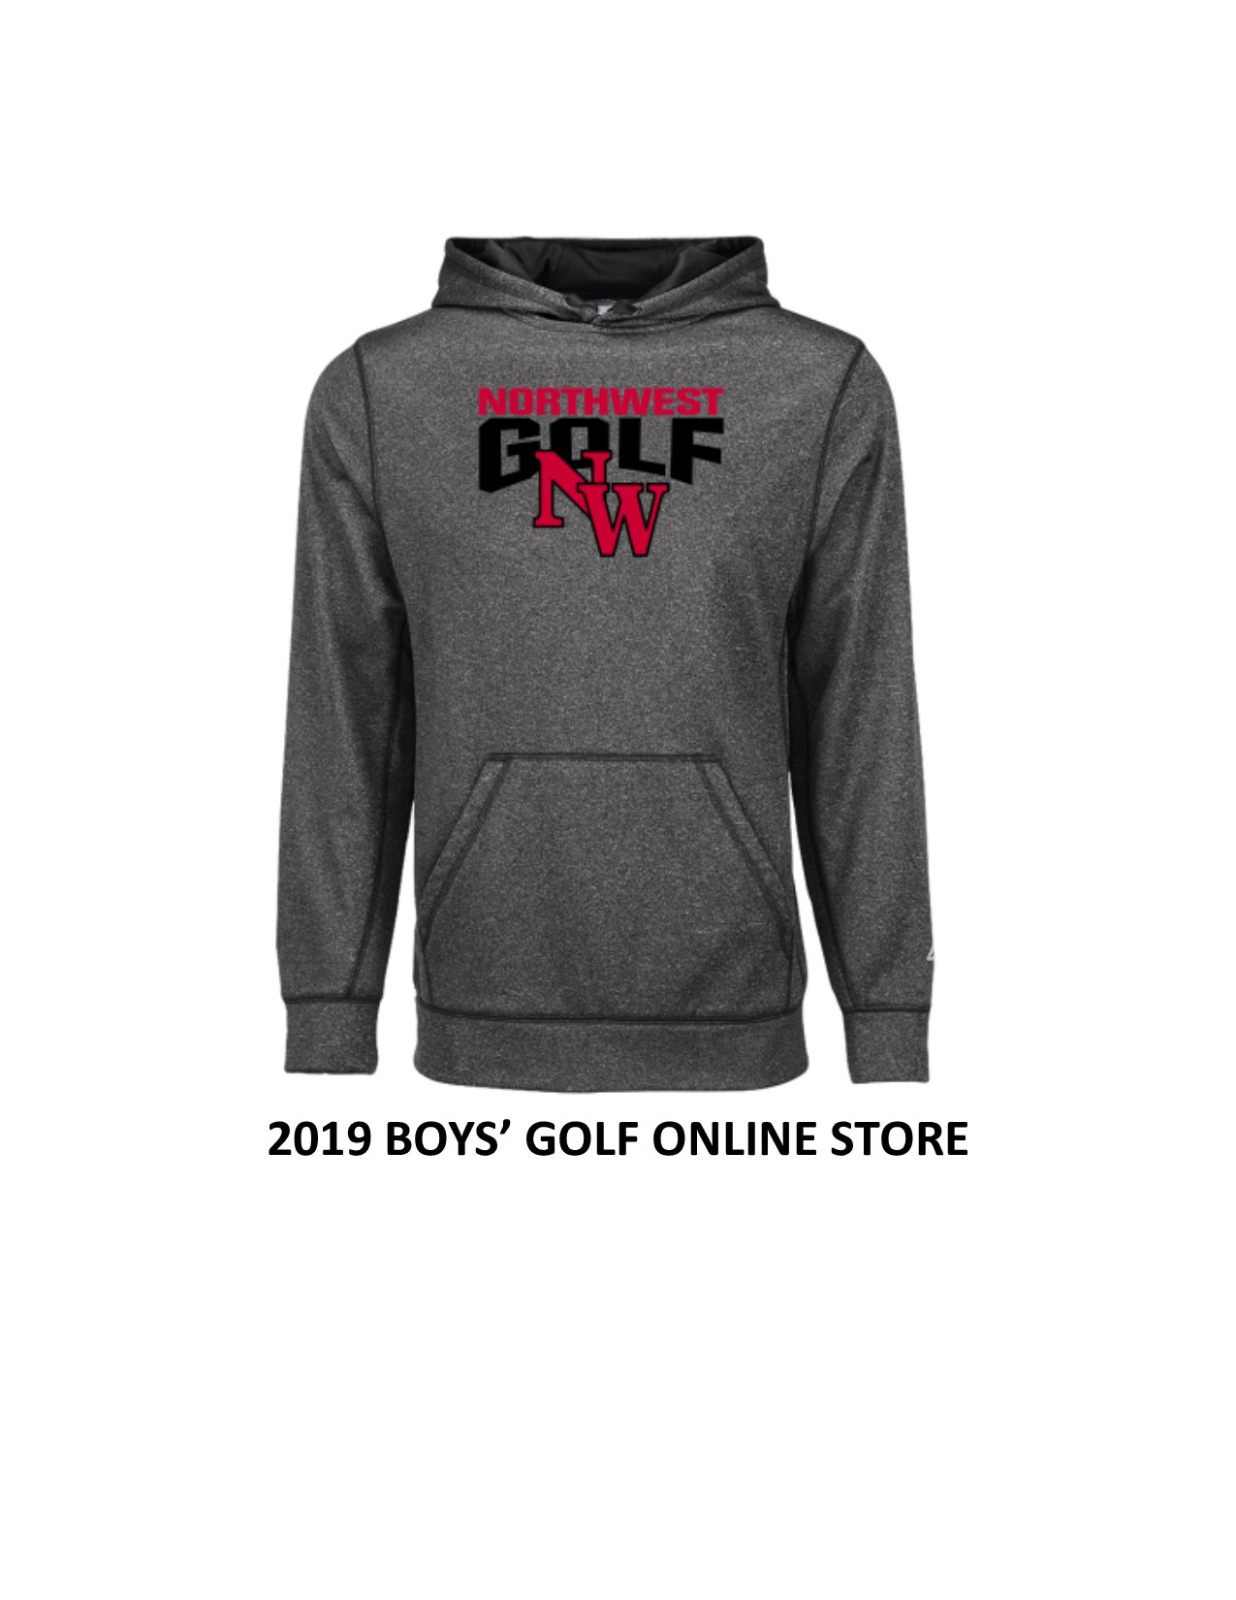 NW – 2019 Boys' Golf Apparel Store